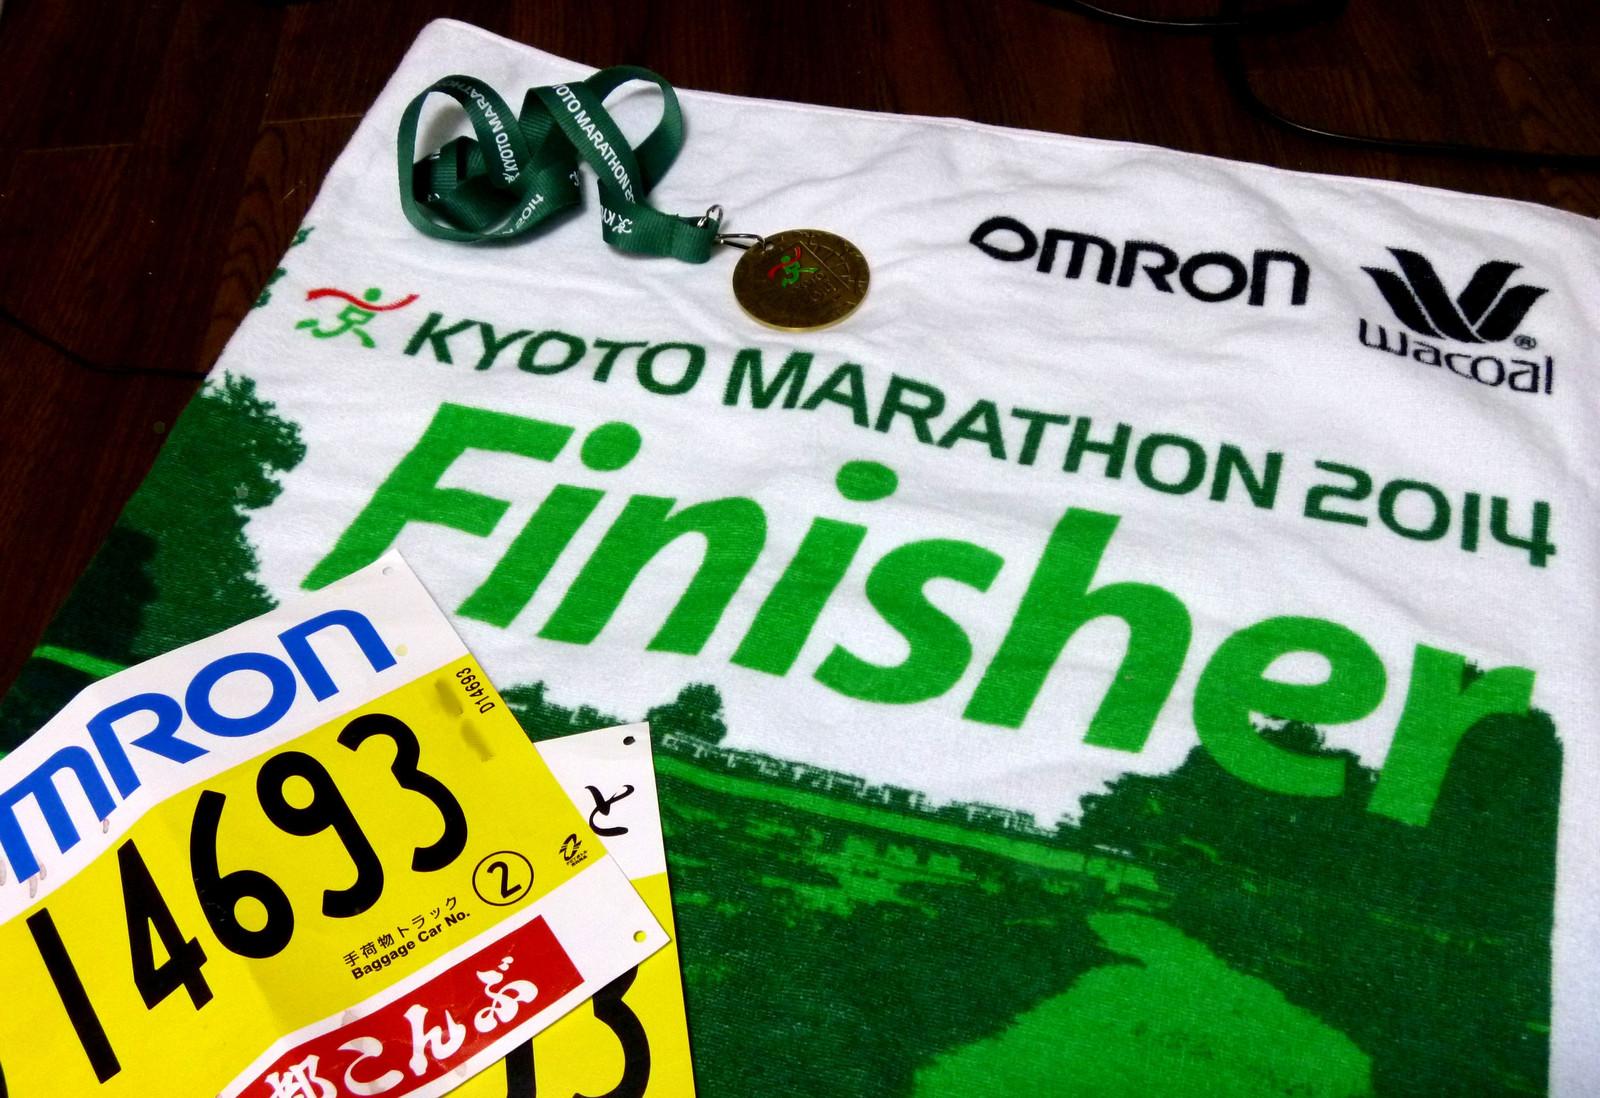 Kyotomarathon20142